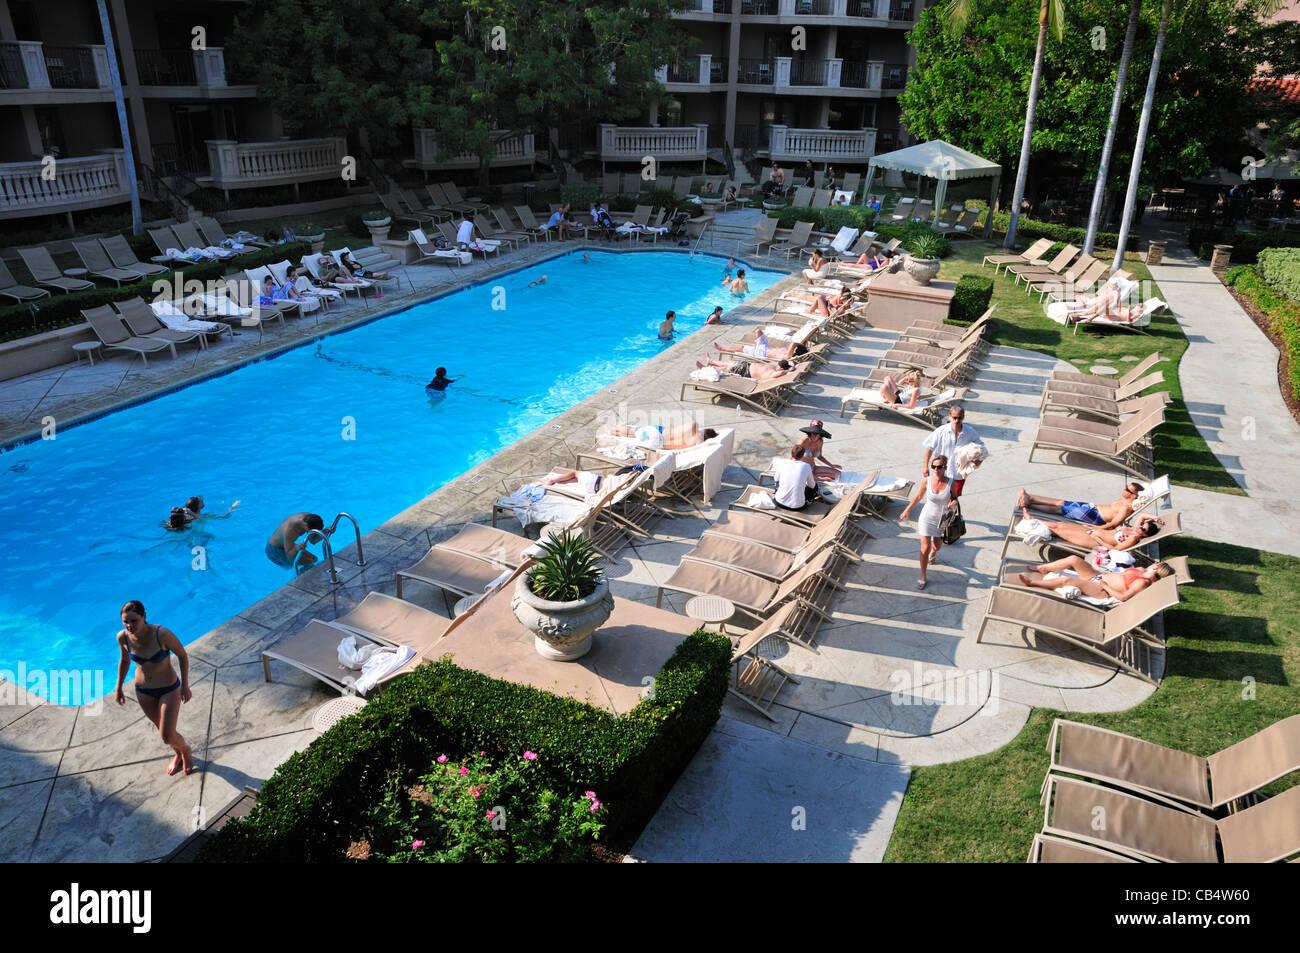 Outdoor swimming pool of the Langham Huntington Hotel, Pasadena, California - Stock Image